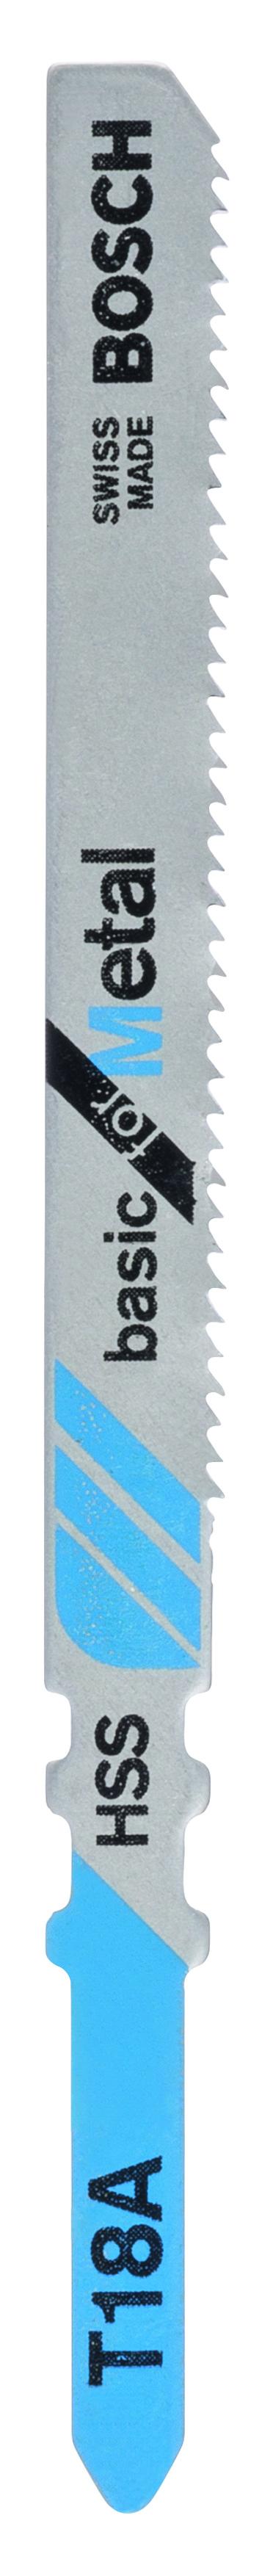 Image of   Stiksavklinge T 18 A Basic for Metal